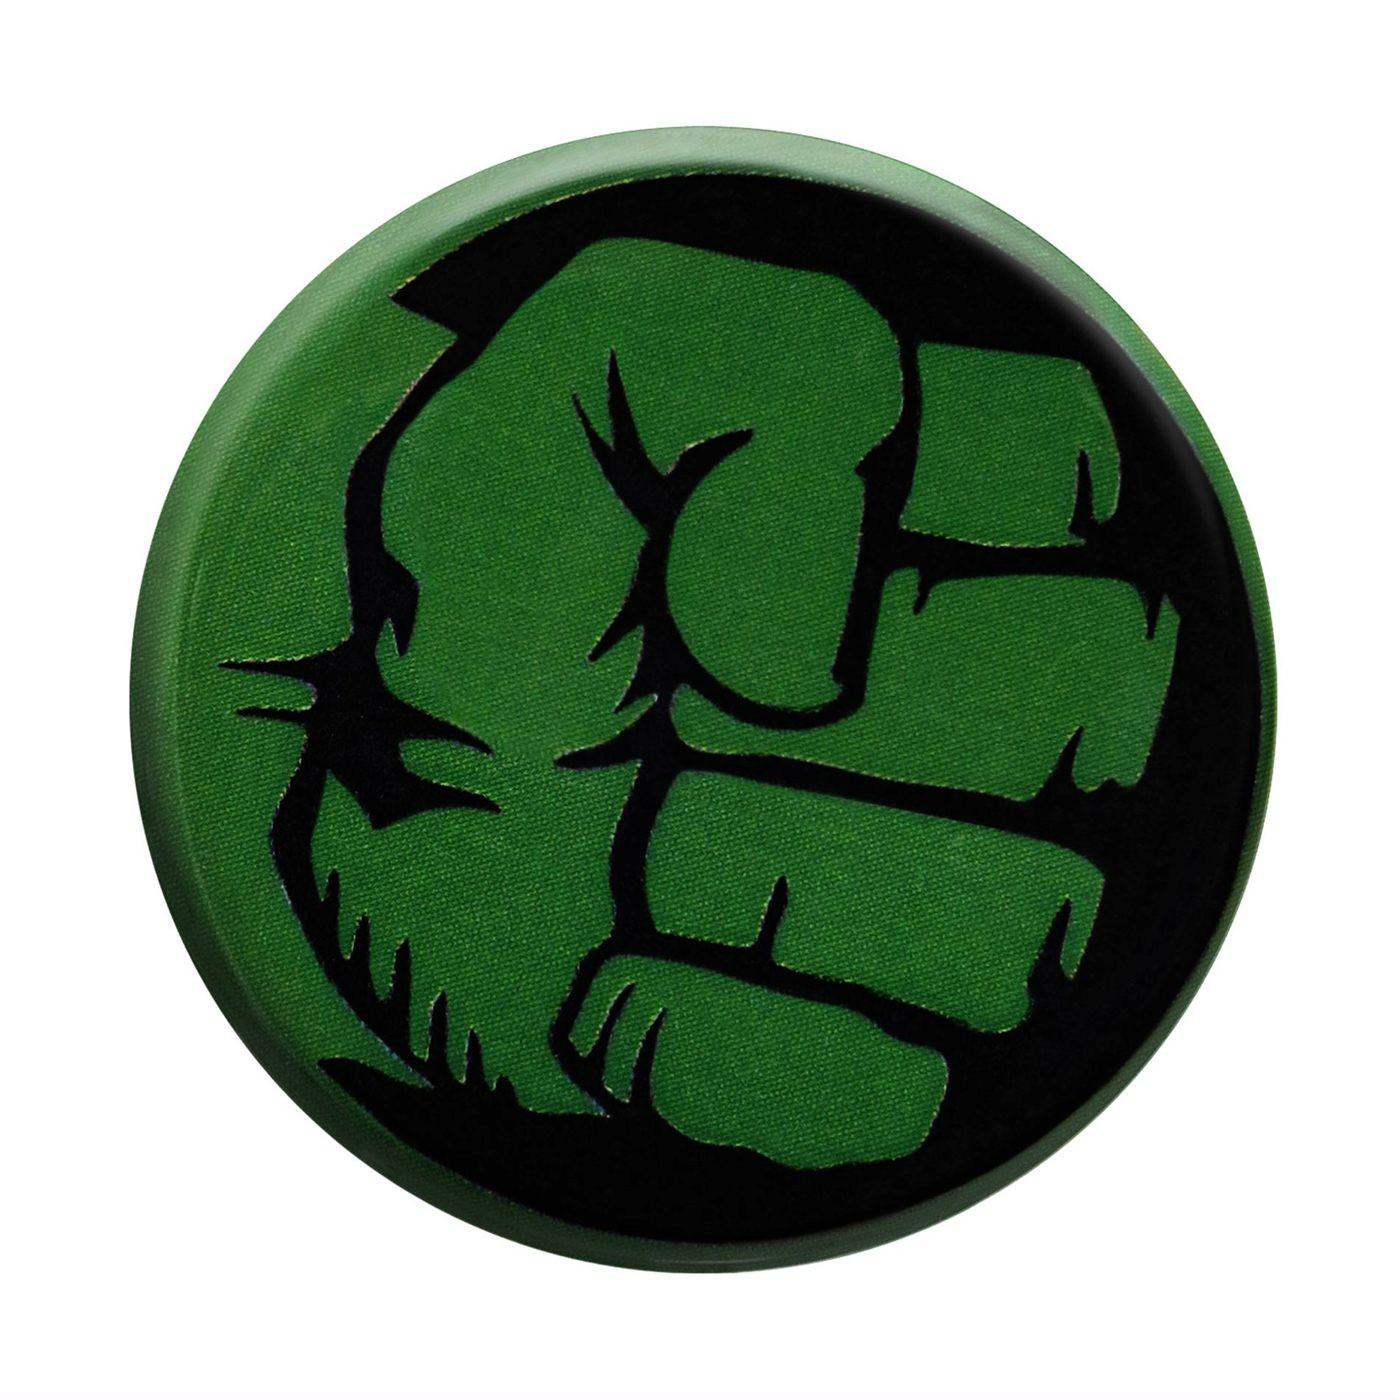 Hulk Fist Black Button